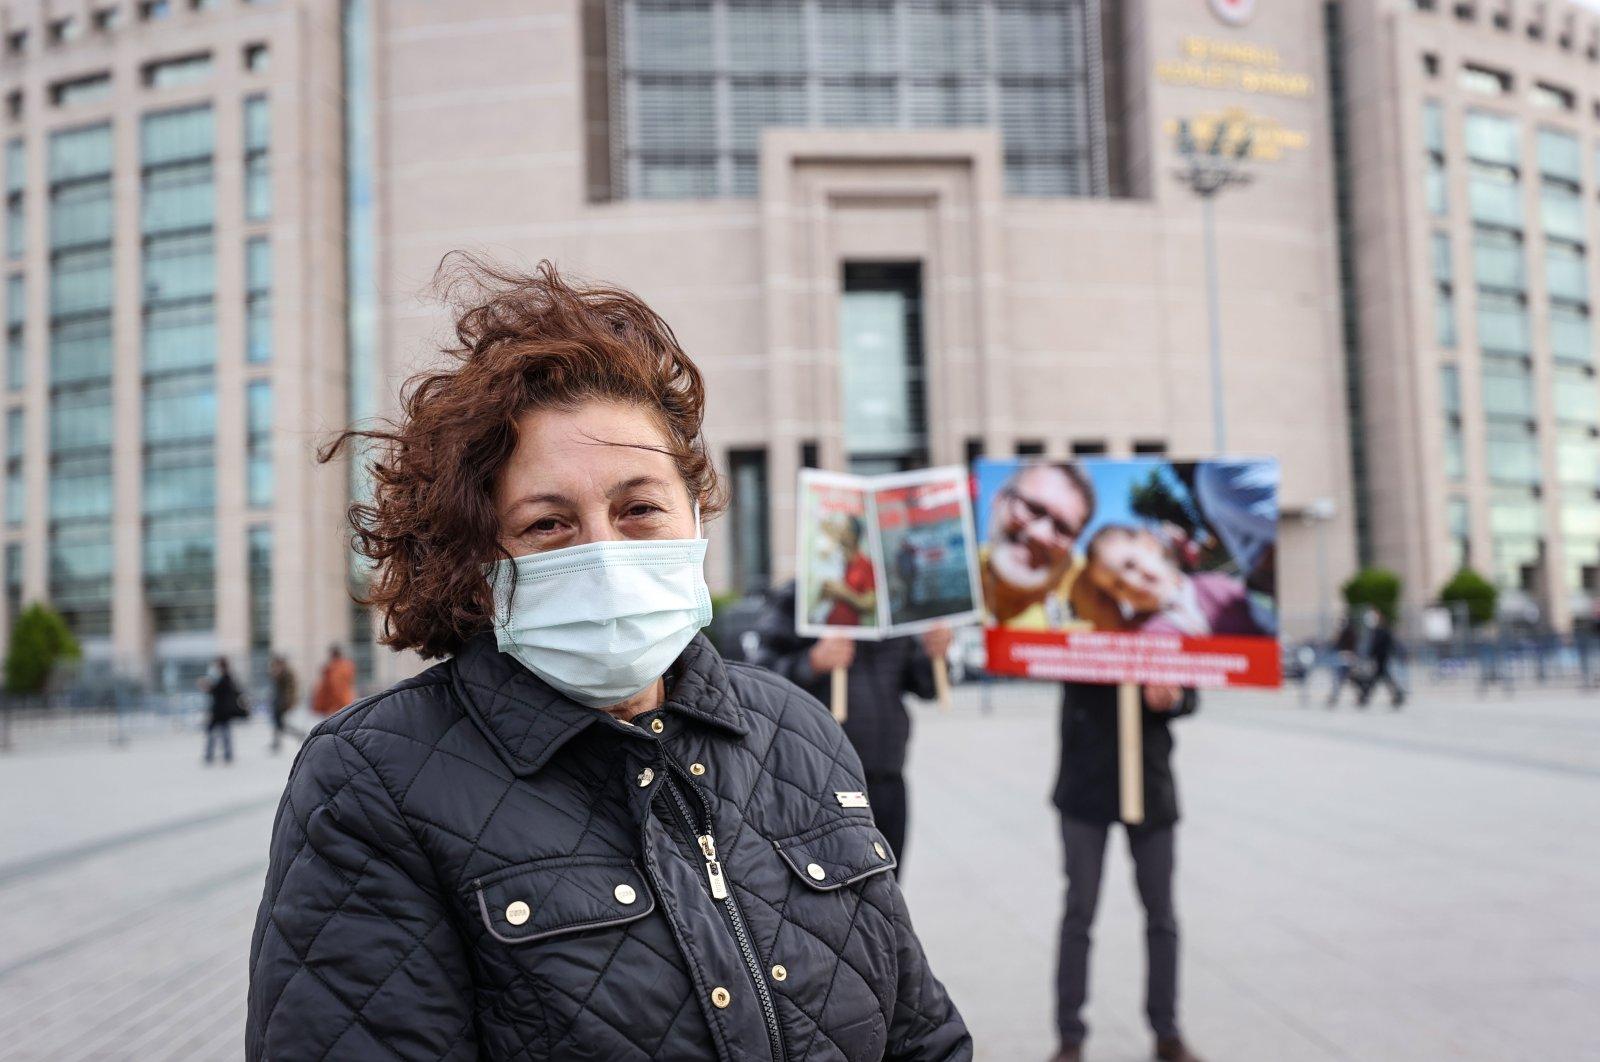 Emine Öztürk protests the imprisonment of his husband Mehmet Ali Öztürk in the UAE in front of a courthouse in Istanbul, Turkey, Dec. 11, 2020. (AA Photo)